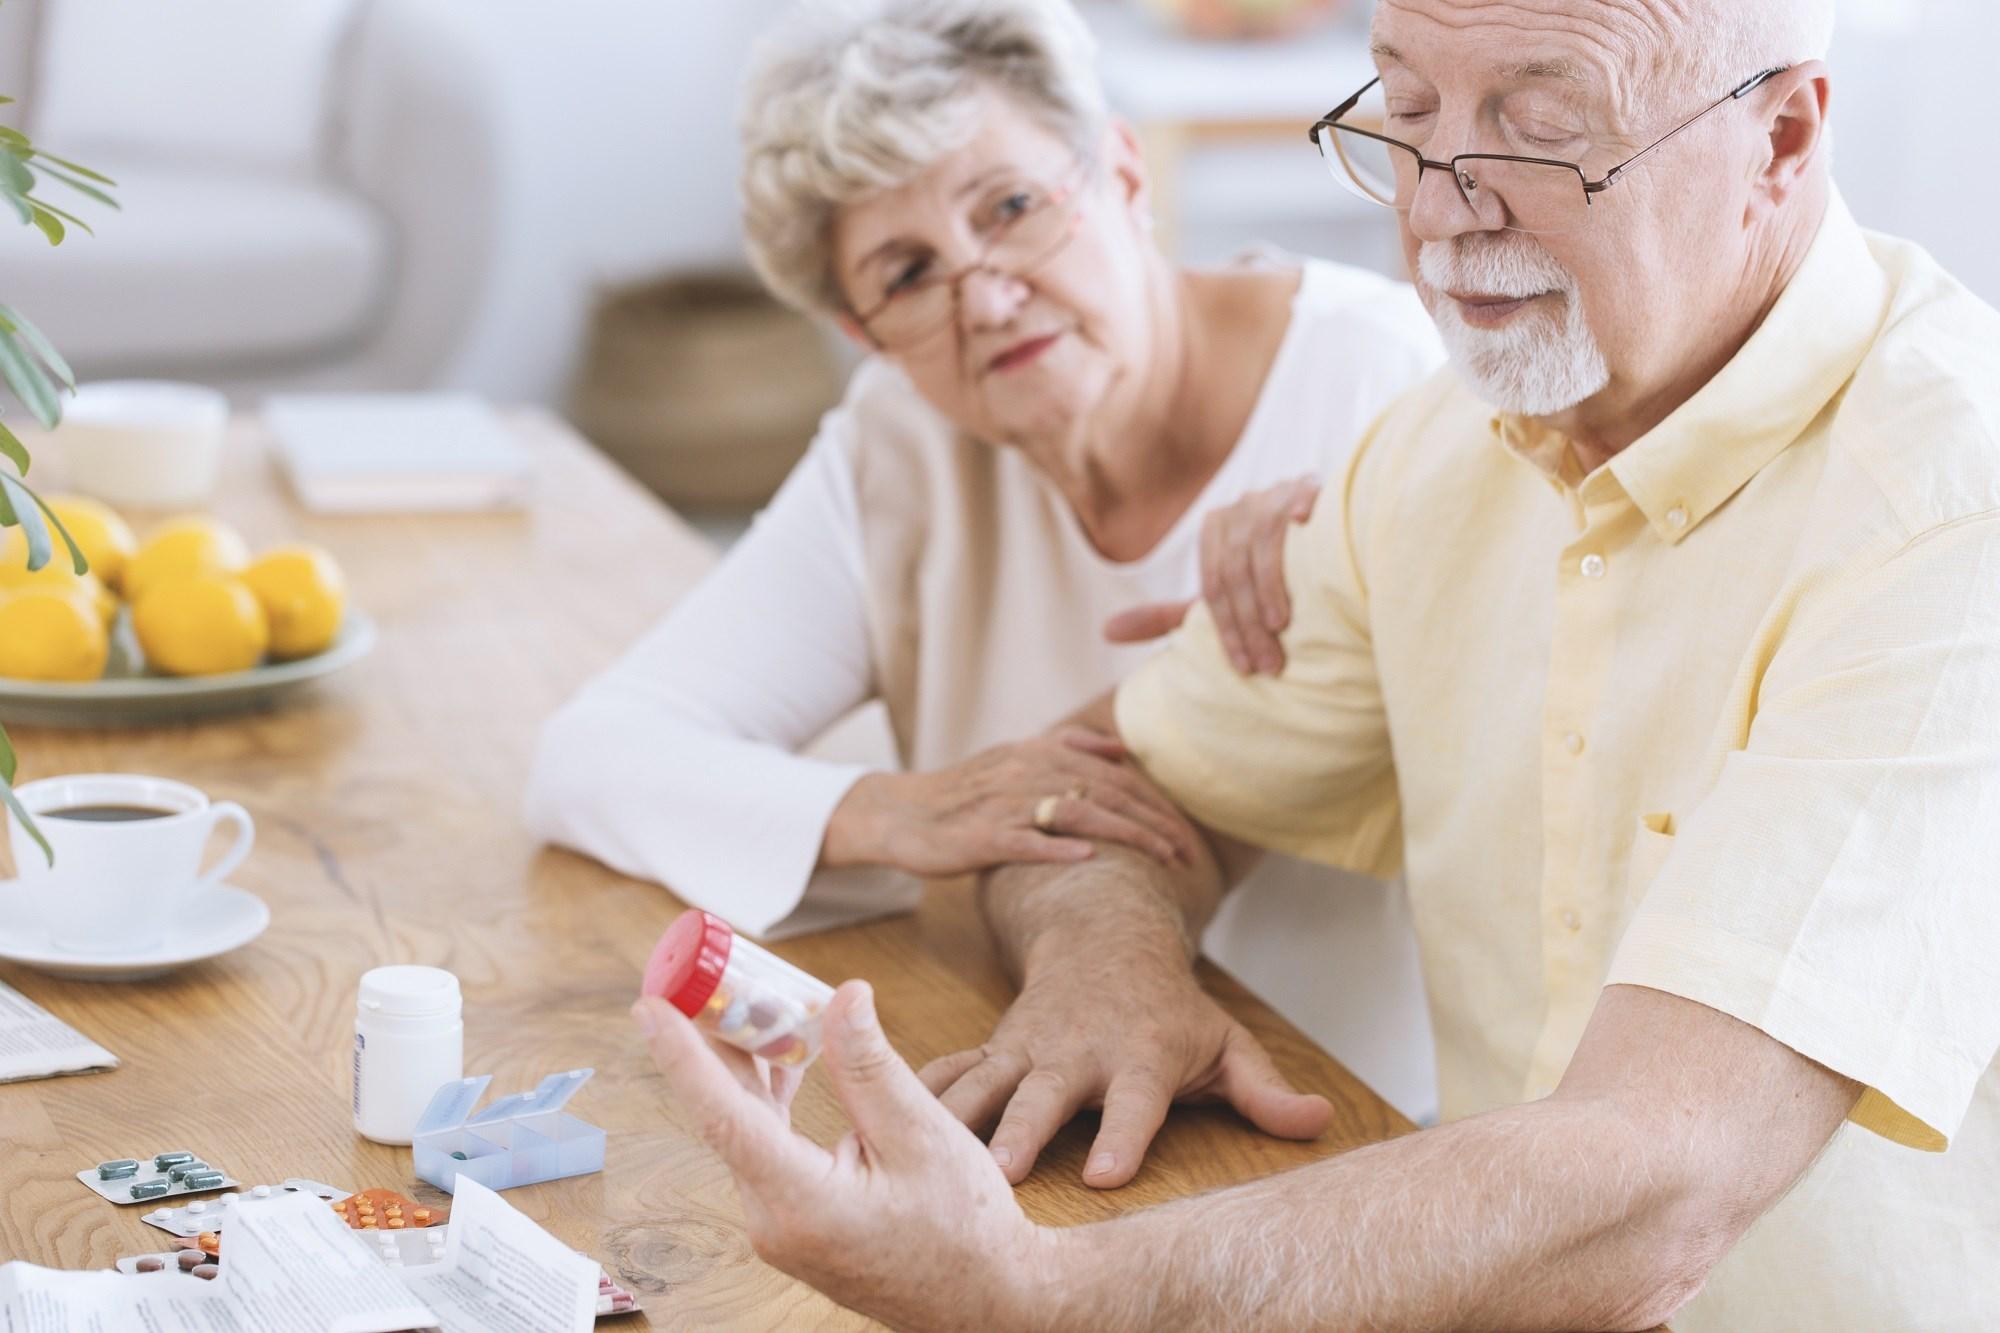 Diabetes Diagnosis May Impact Health Behaviors of Family